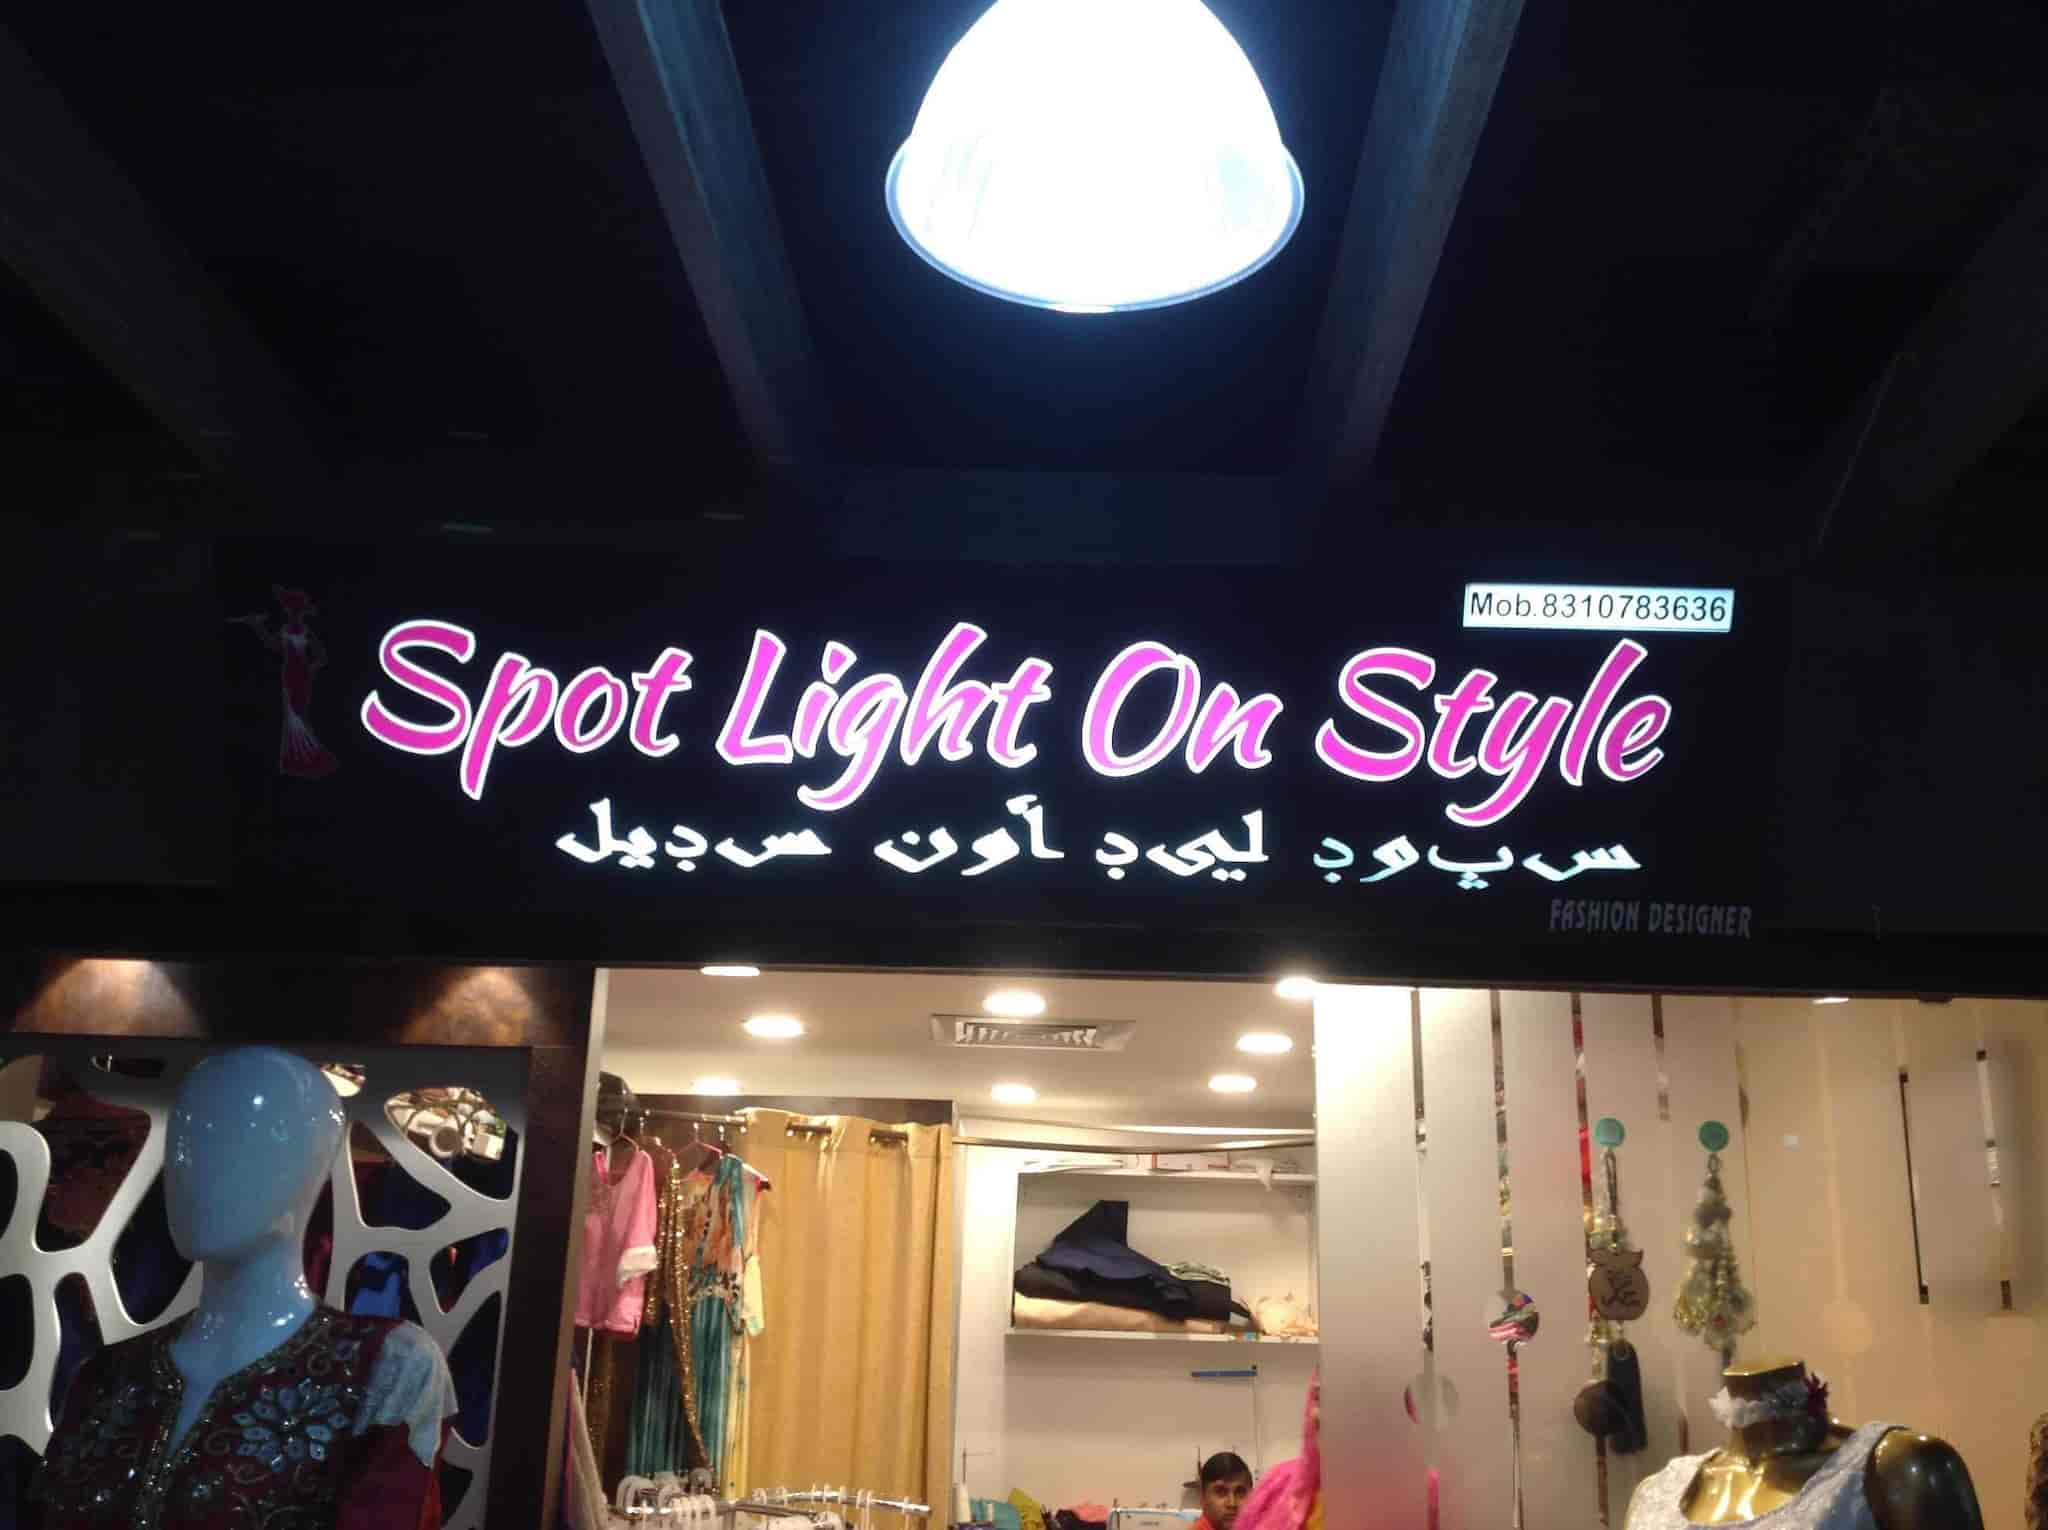 Spot Light On Style Fashion Designer